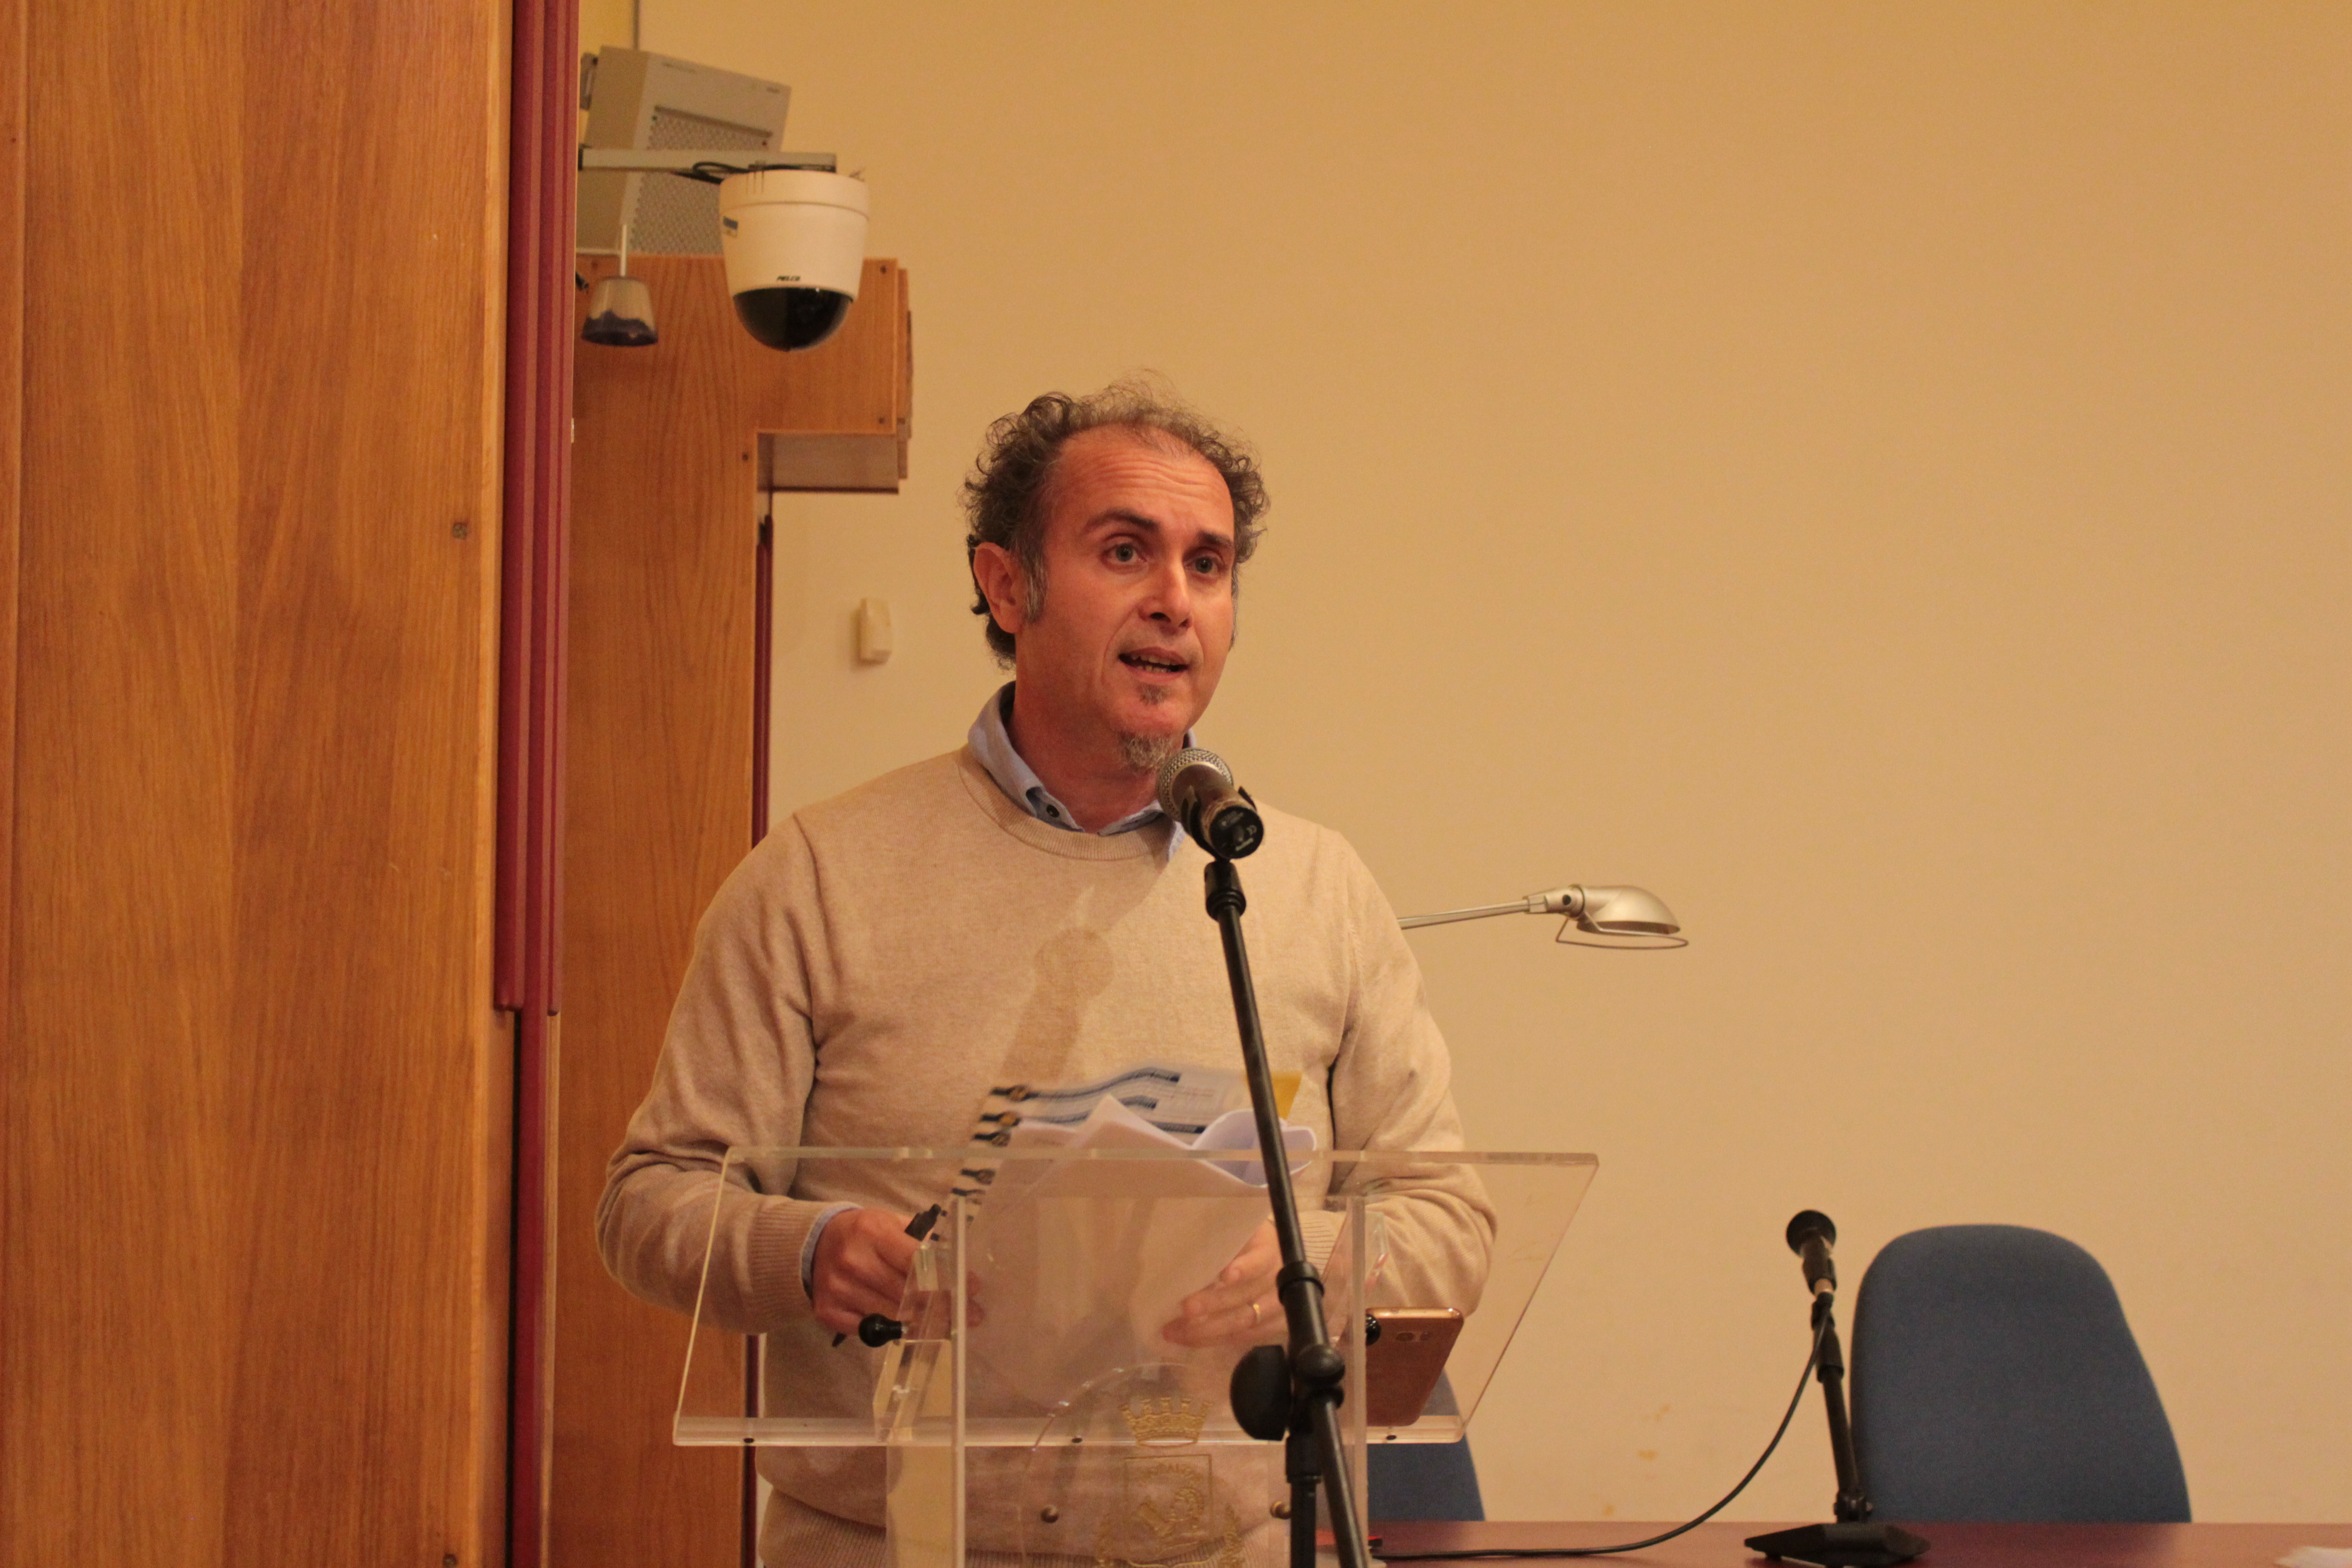 Vincenzo Maurizio Santangelo